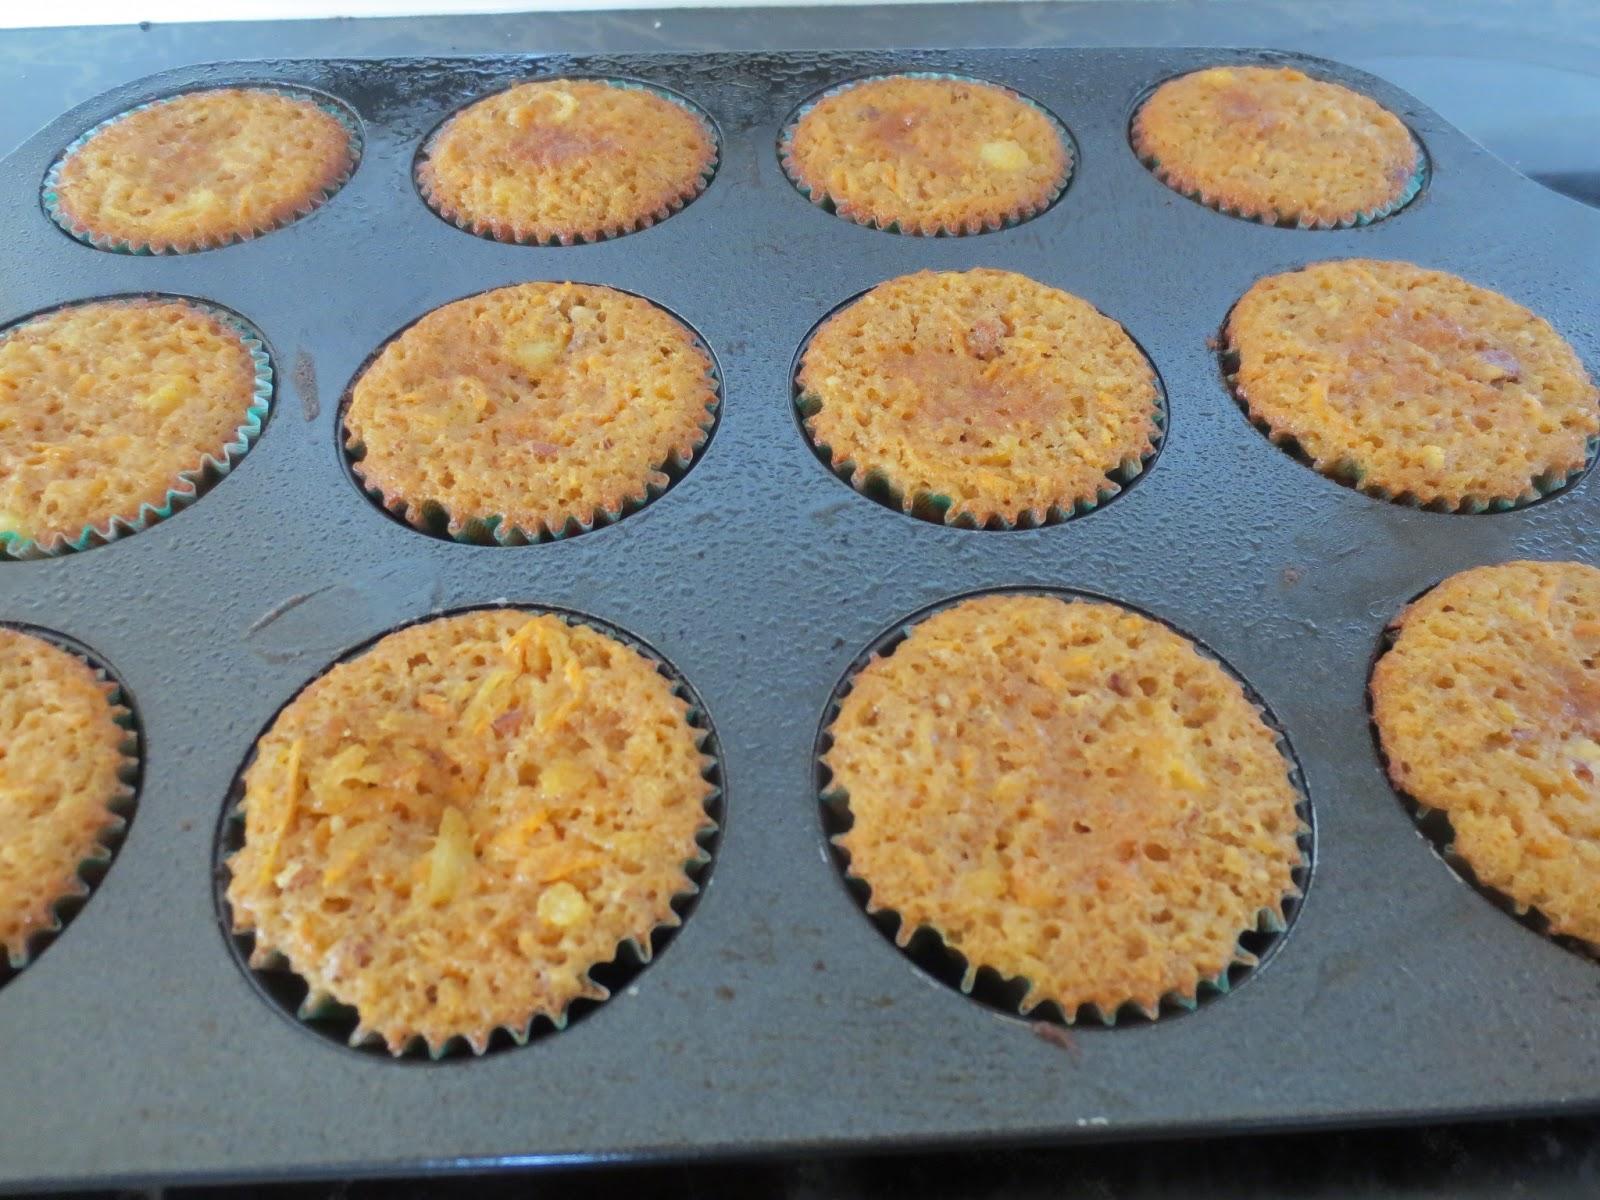 Barefoot Contessa Carrot Cake Muffins